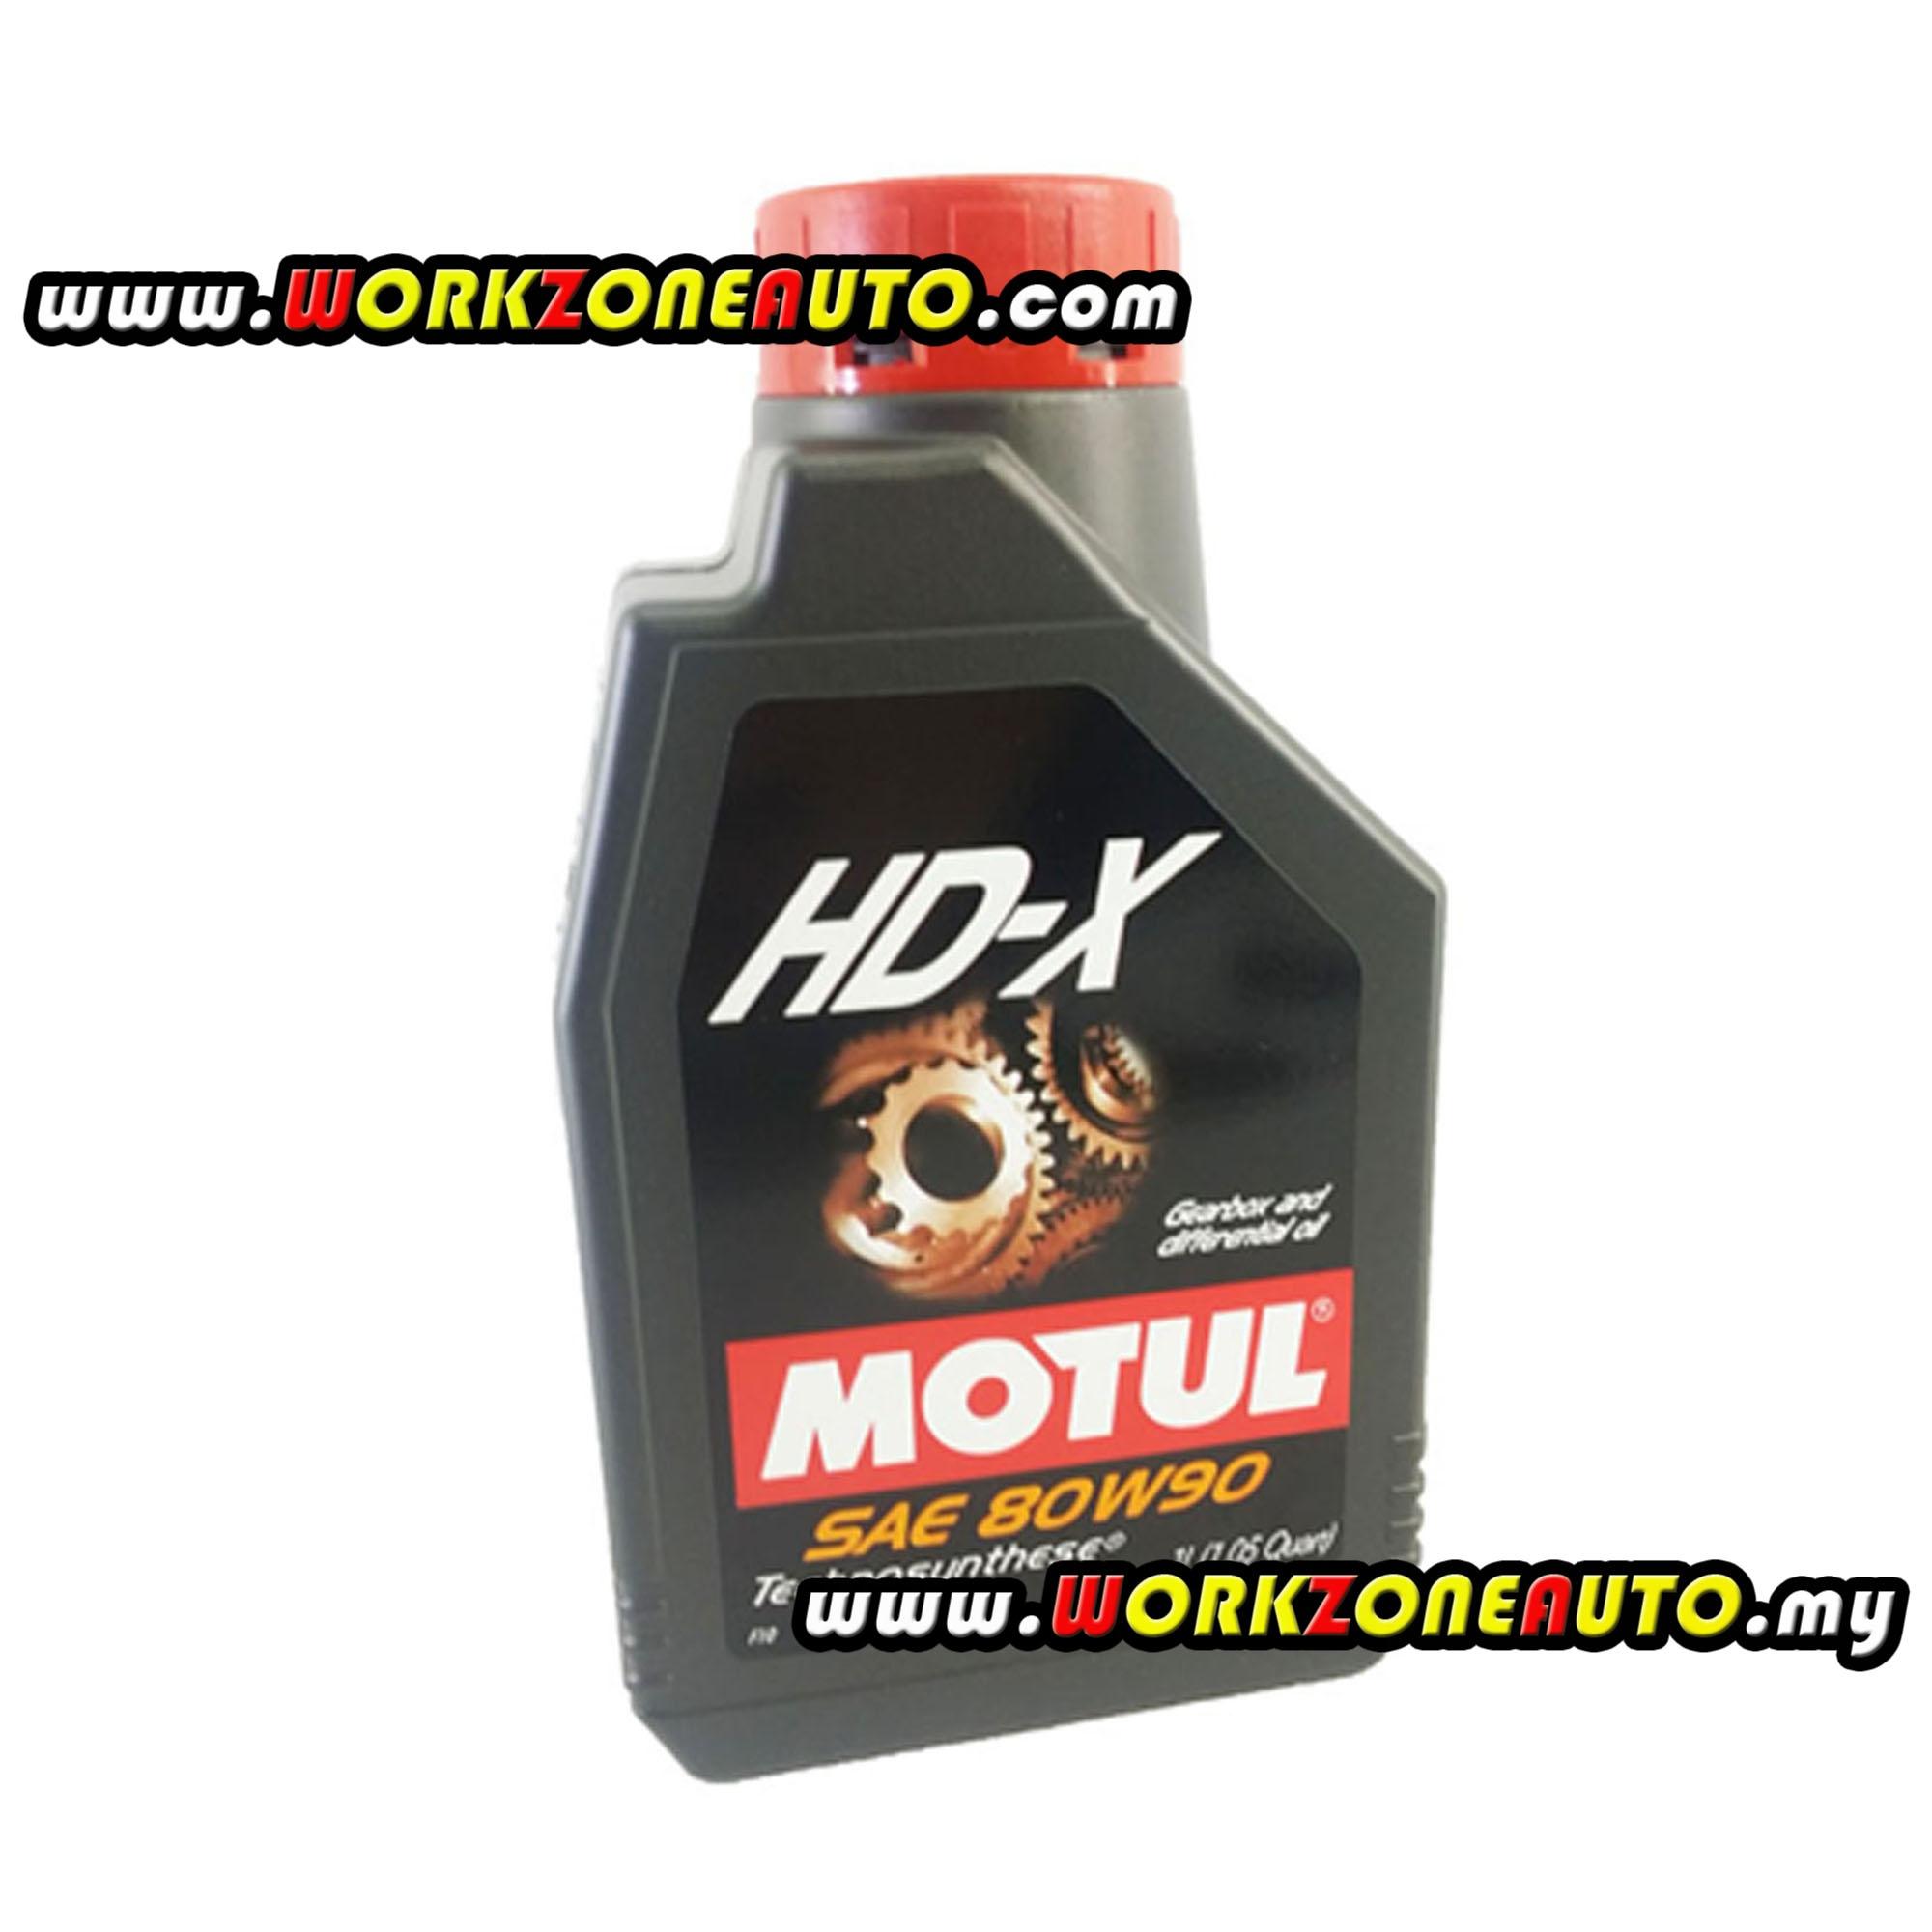 Motul HD-X 80W90 Semi Synthetic Gear Oil 1L